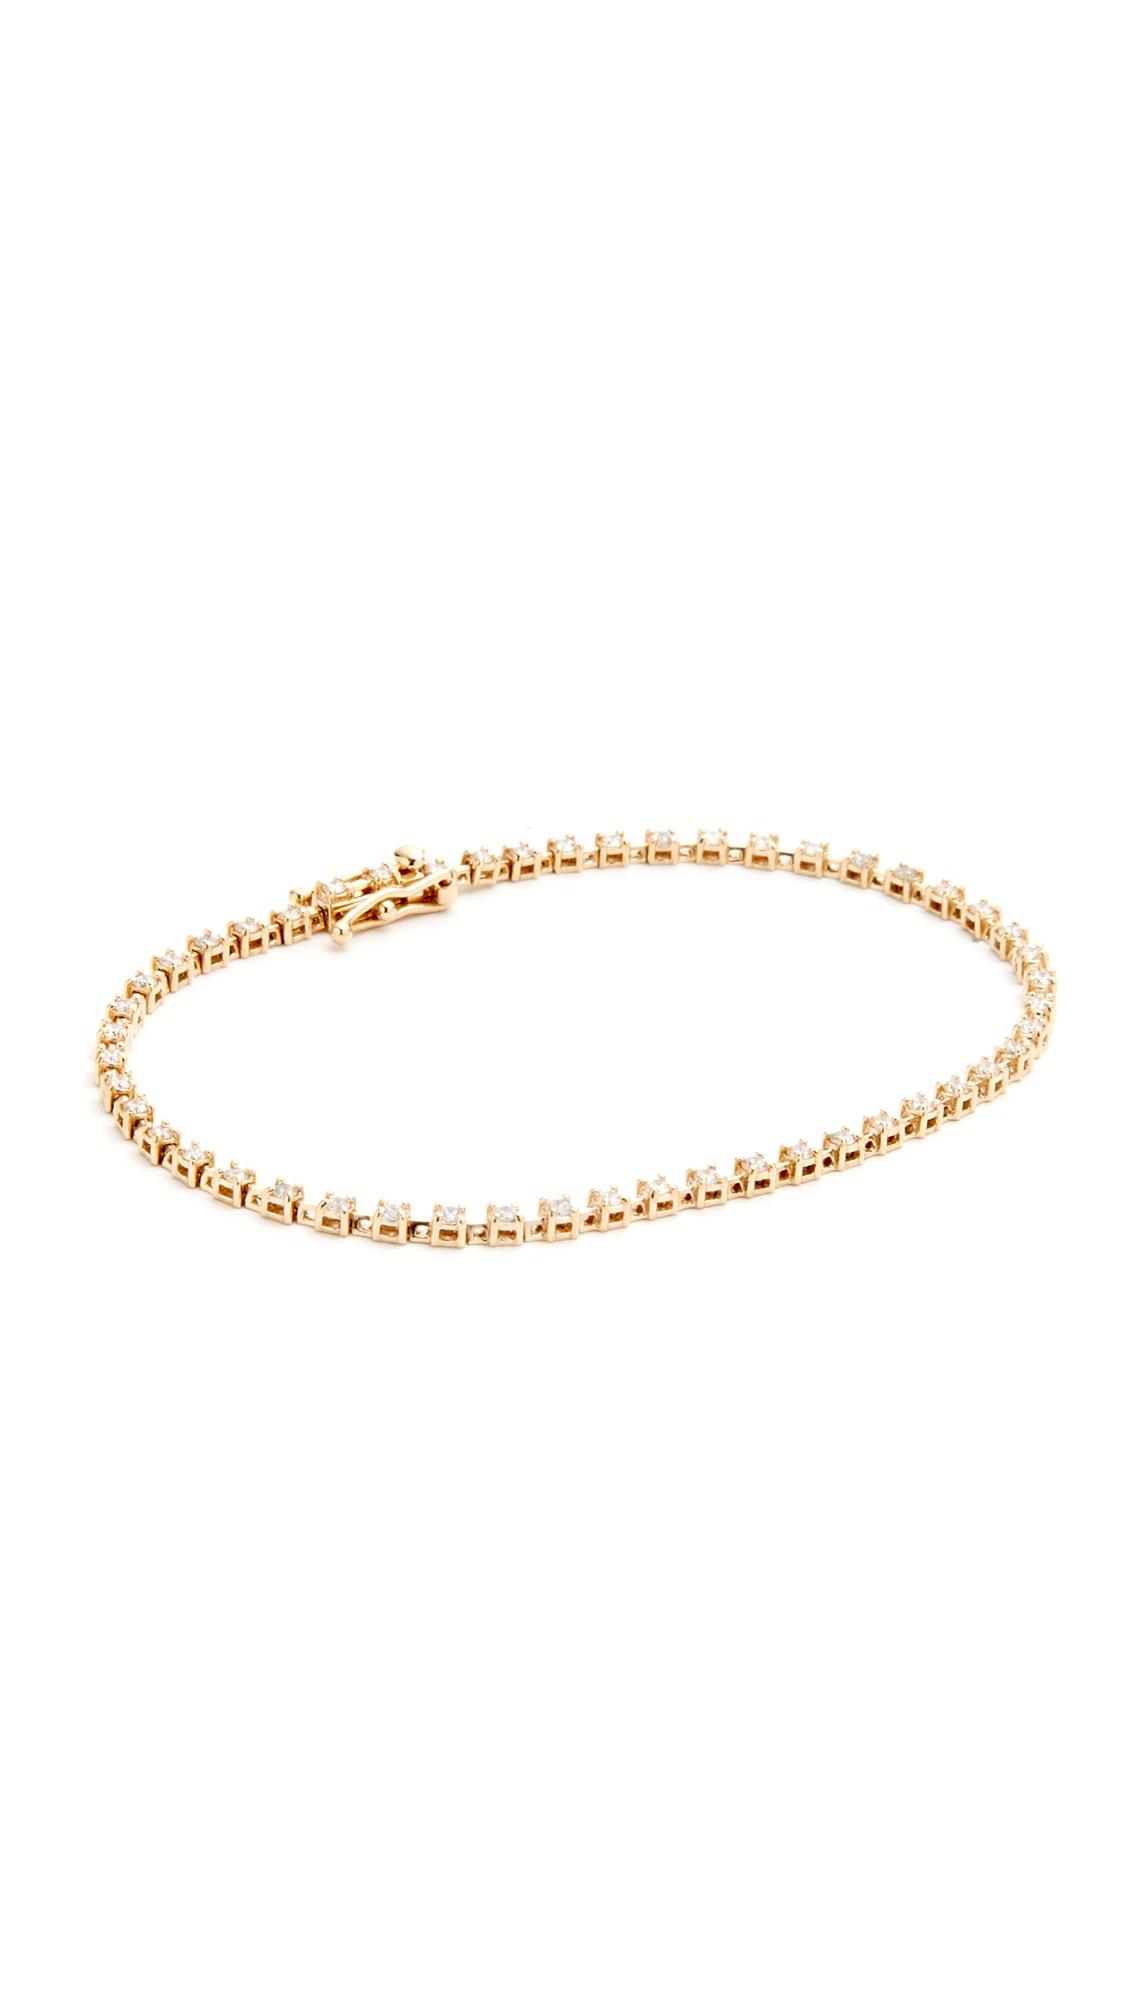 Ariel Gordon Jewelry 14k Gold Diamond Tennis Bracelet - Gold